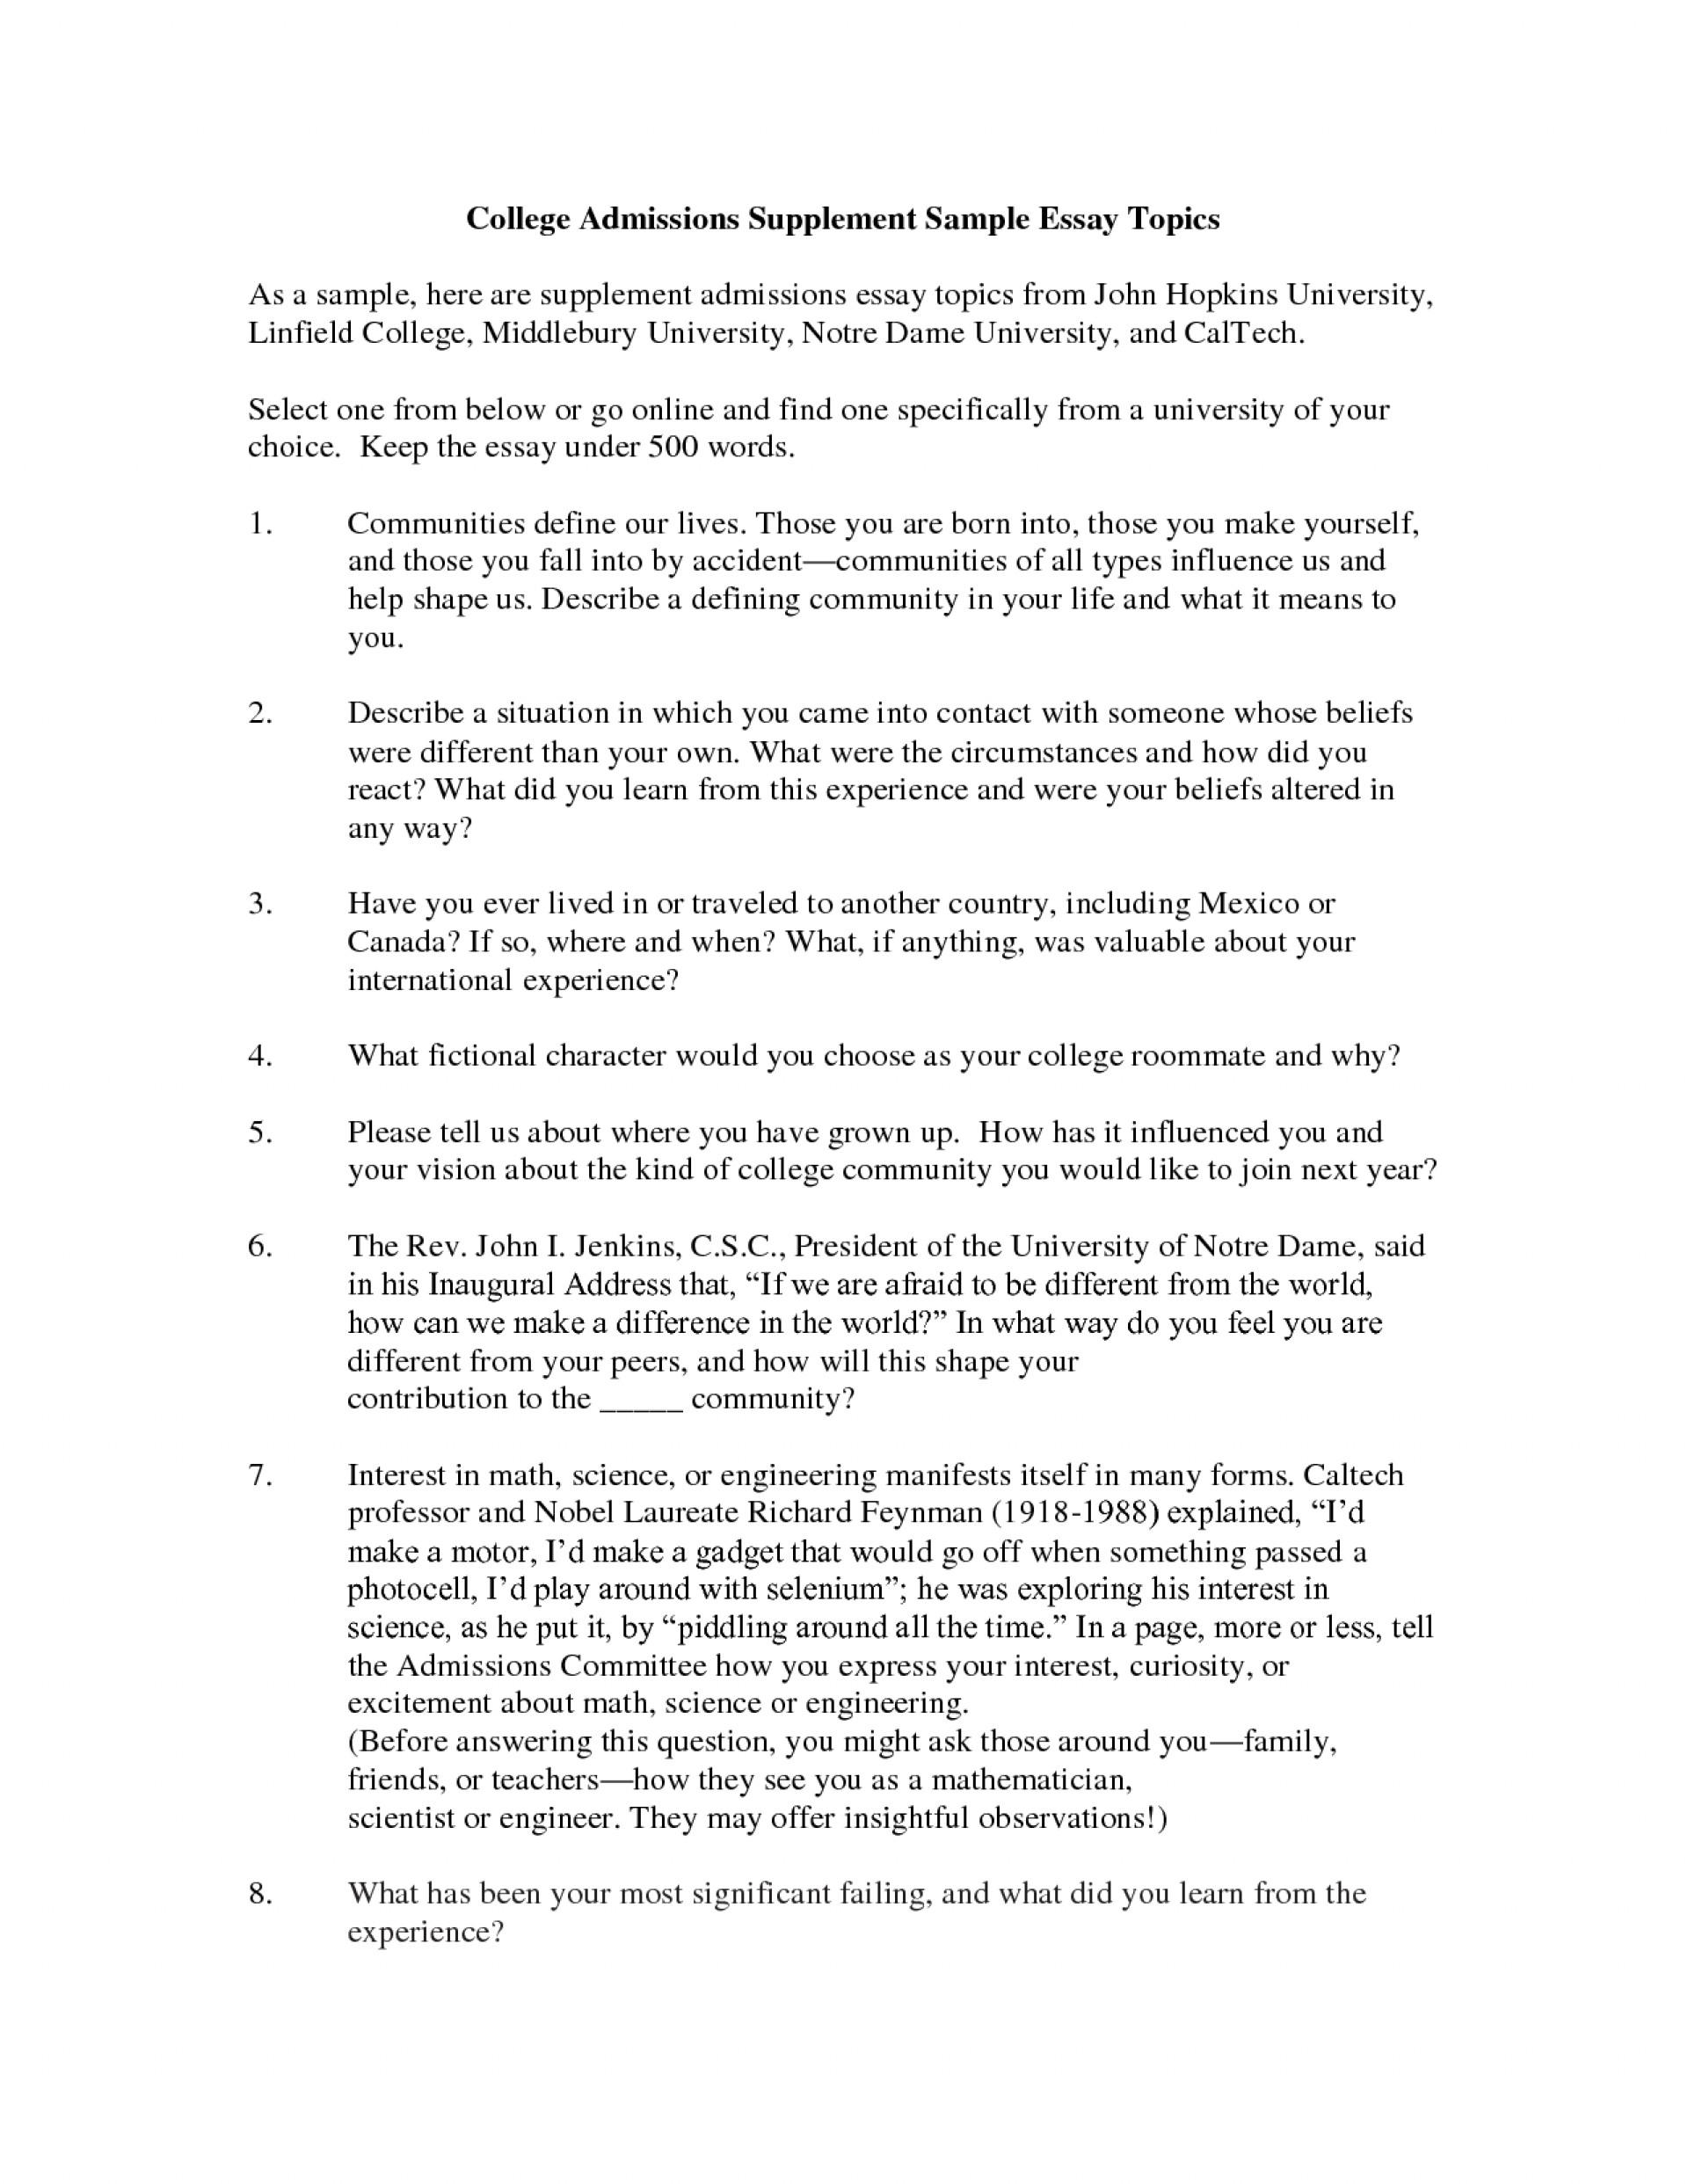 010 Essay Example Apply Texas Ukran Soochi Co Uw Milwaukee Application Question College Topics 4 Madison Questions La Incredible Examples Transfer 1920